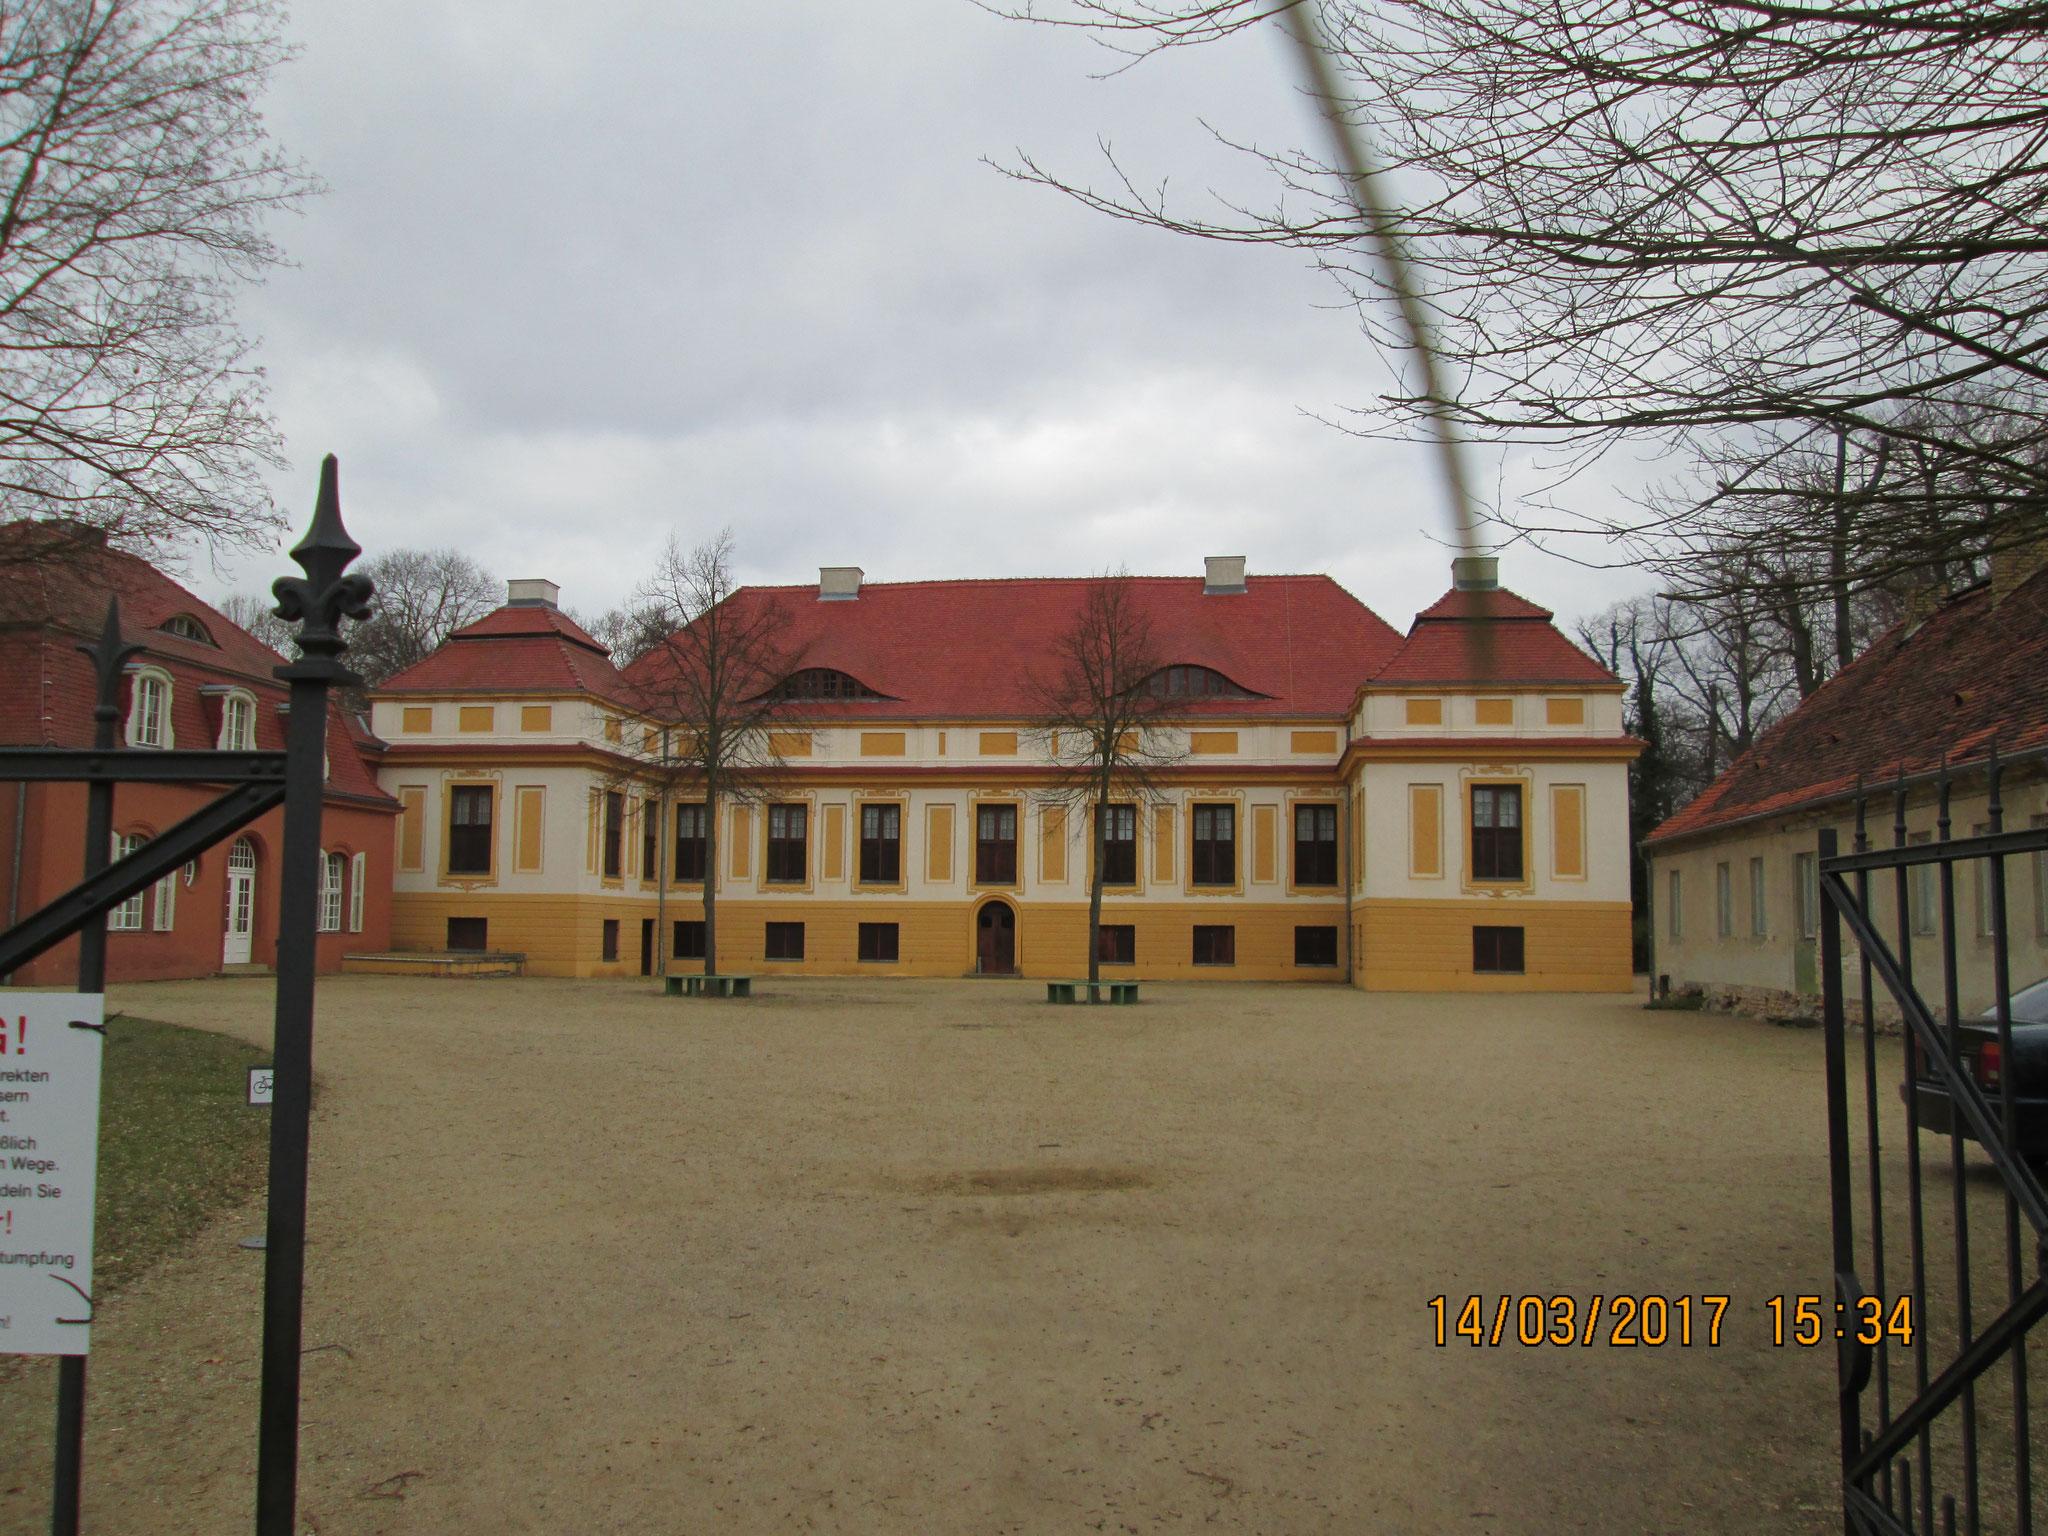 Schloss Caputh